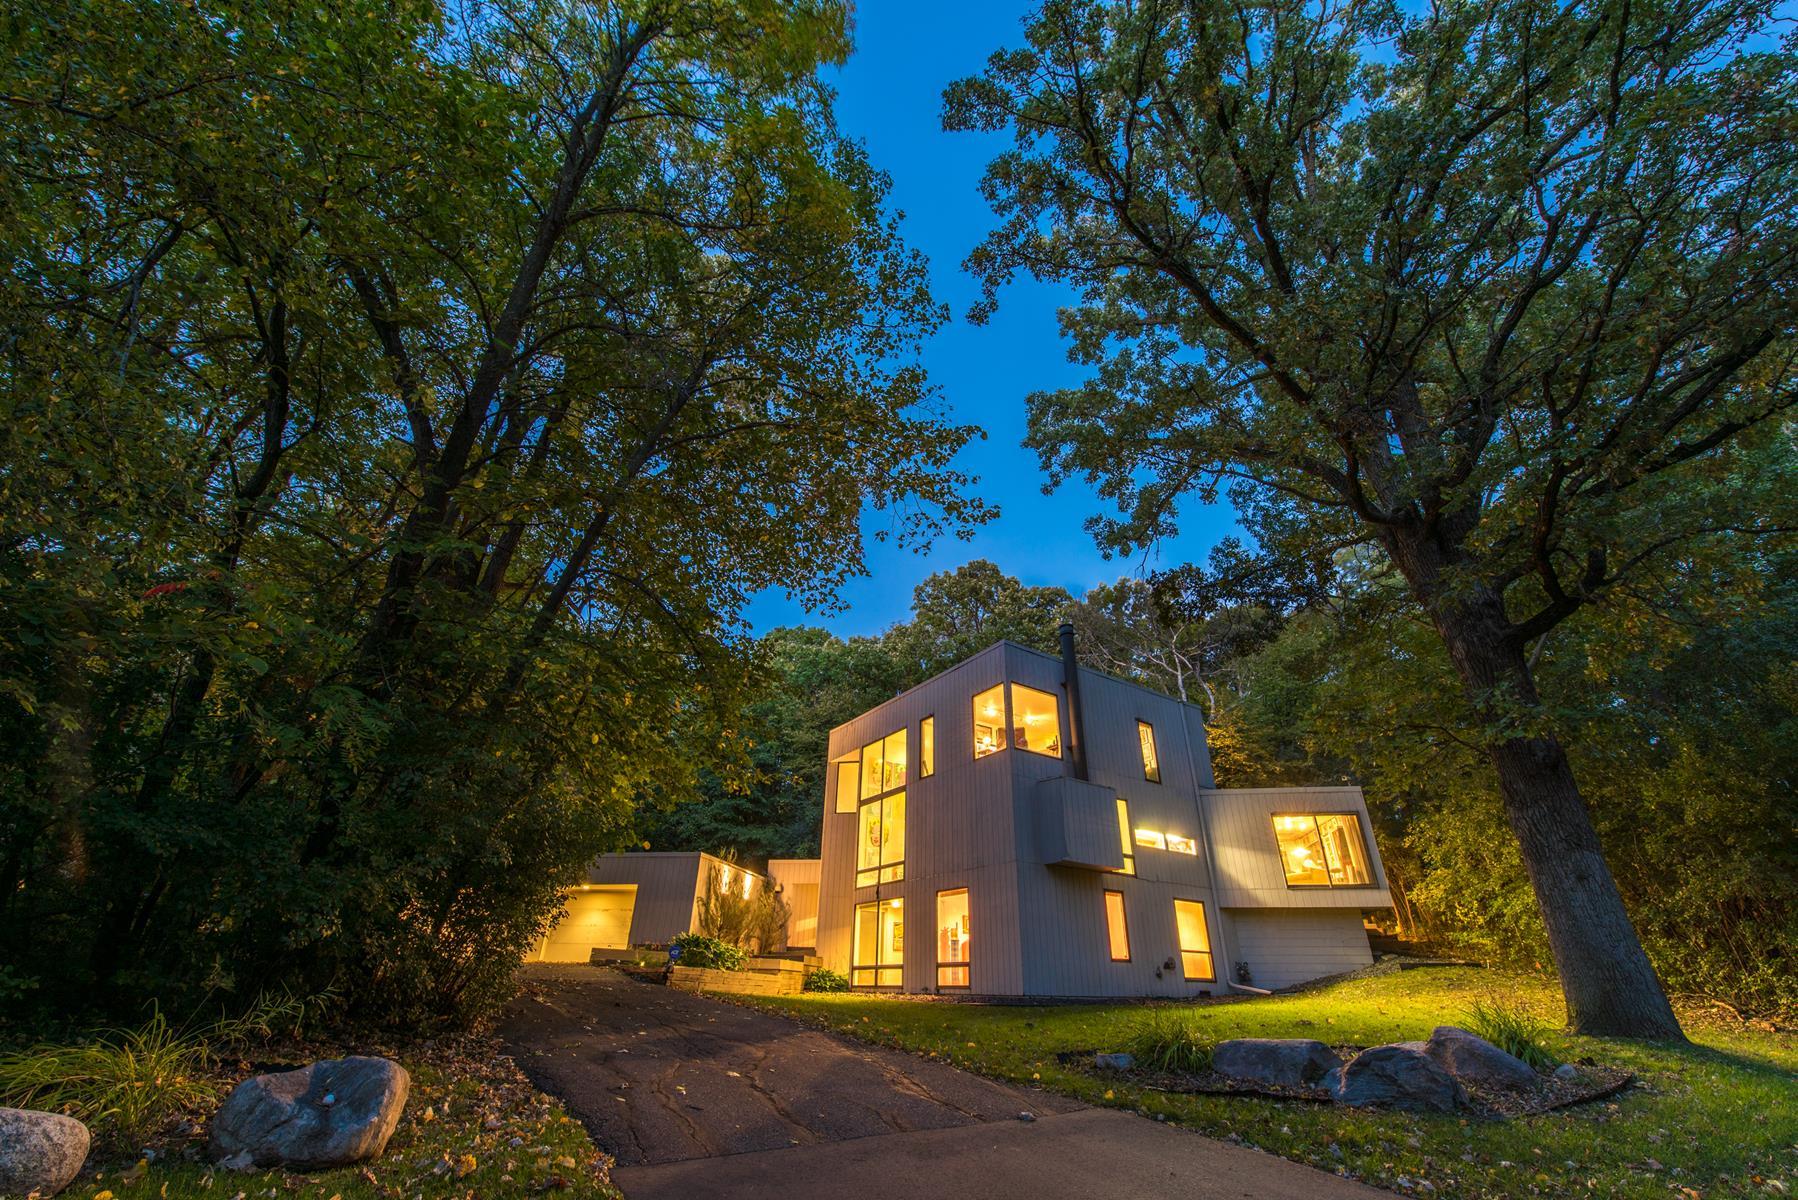 Single Family Home for Sale at 14008 Tribal Trail Minnetonka, Minnesota, 55305 United States